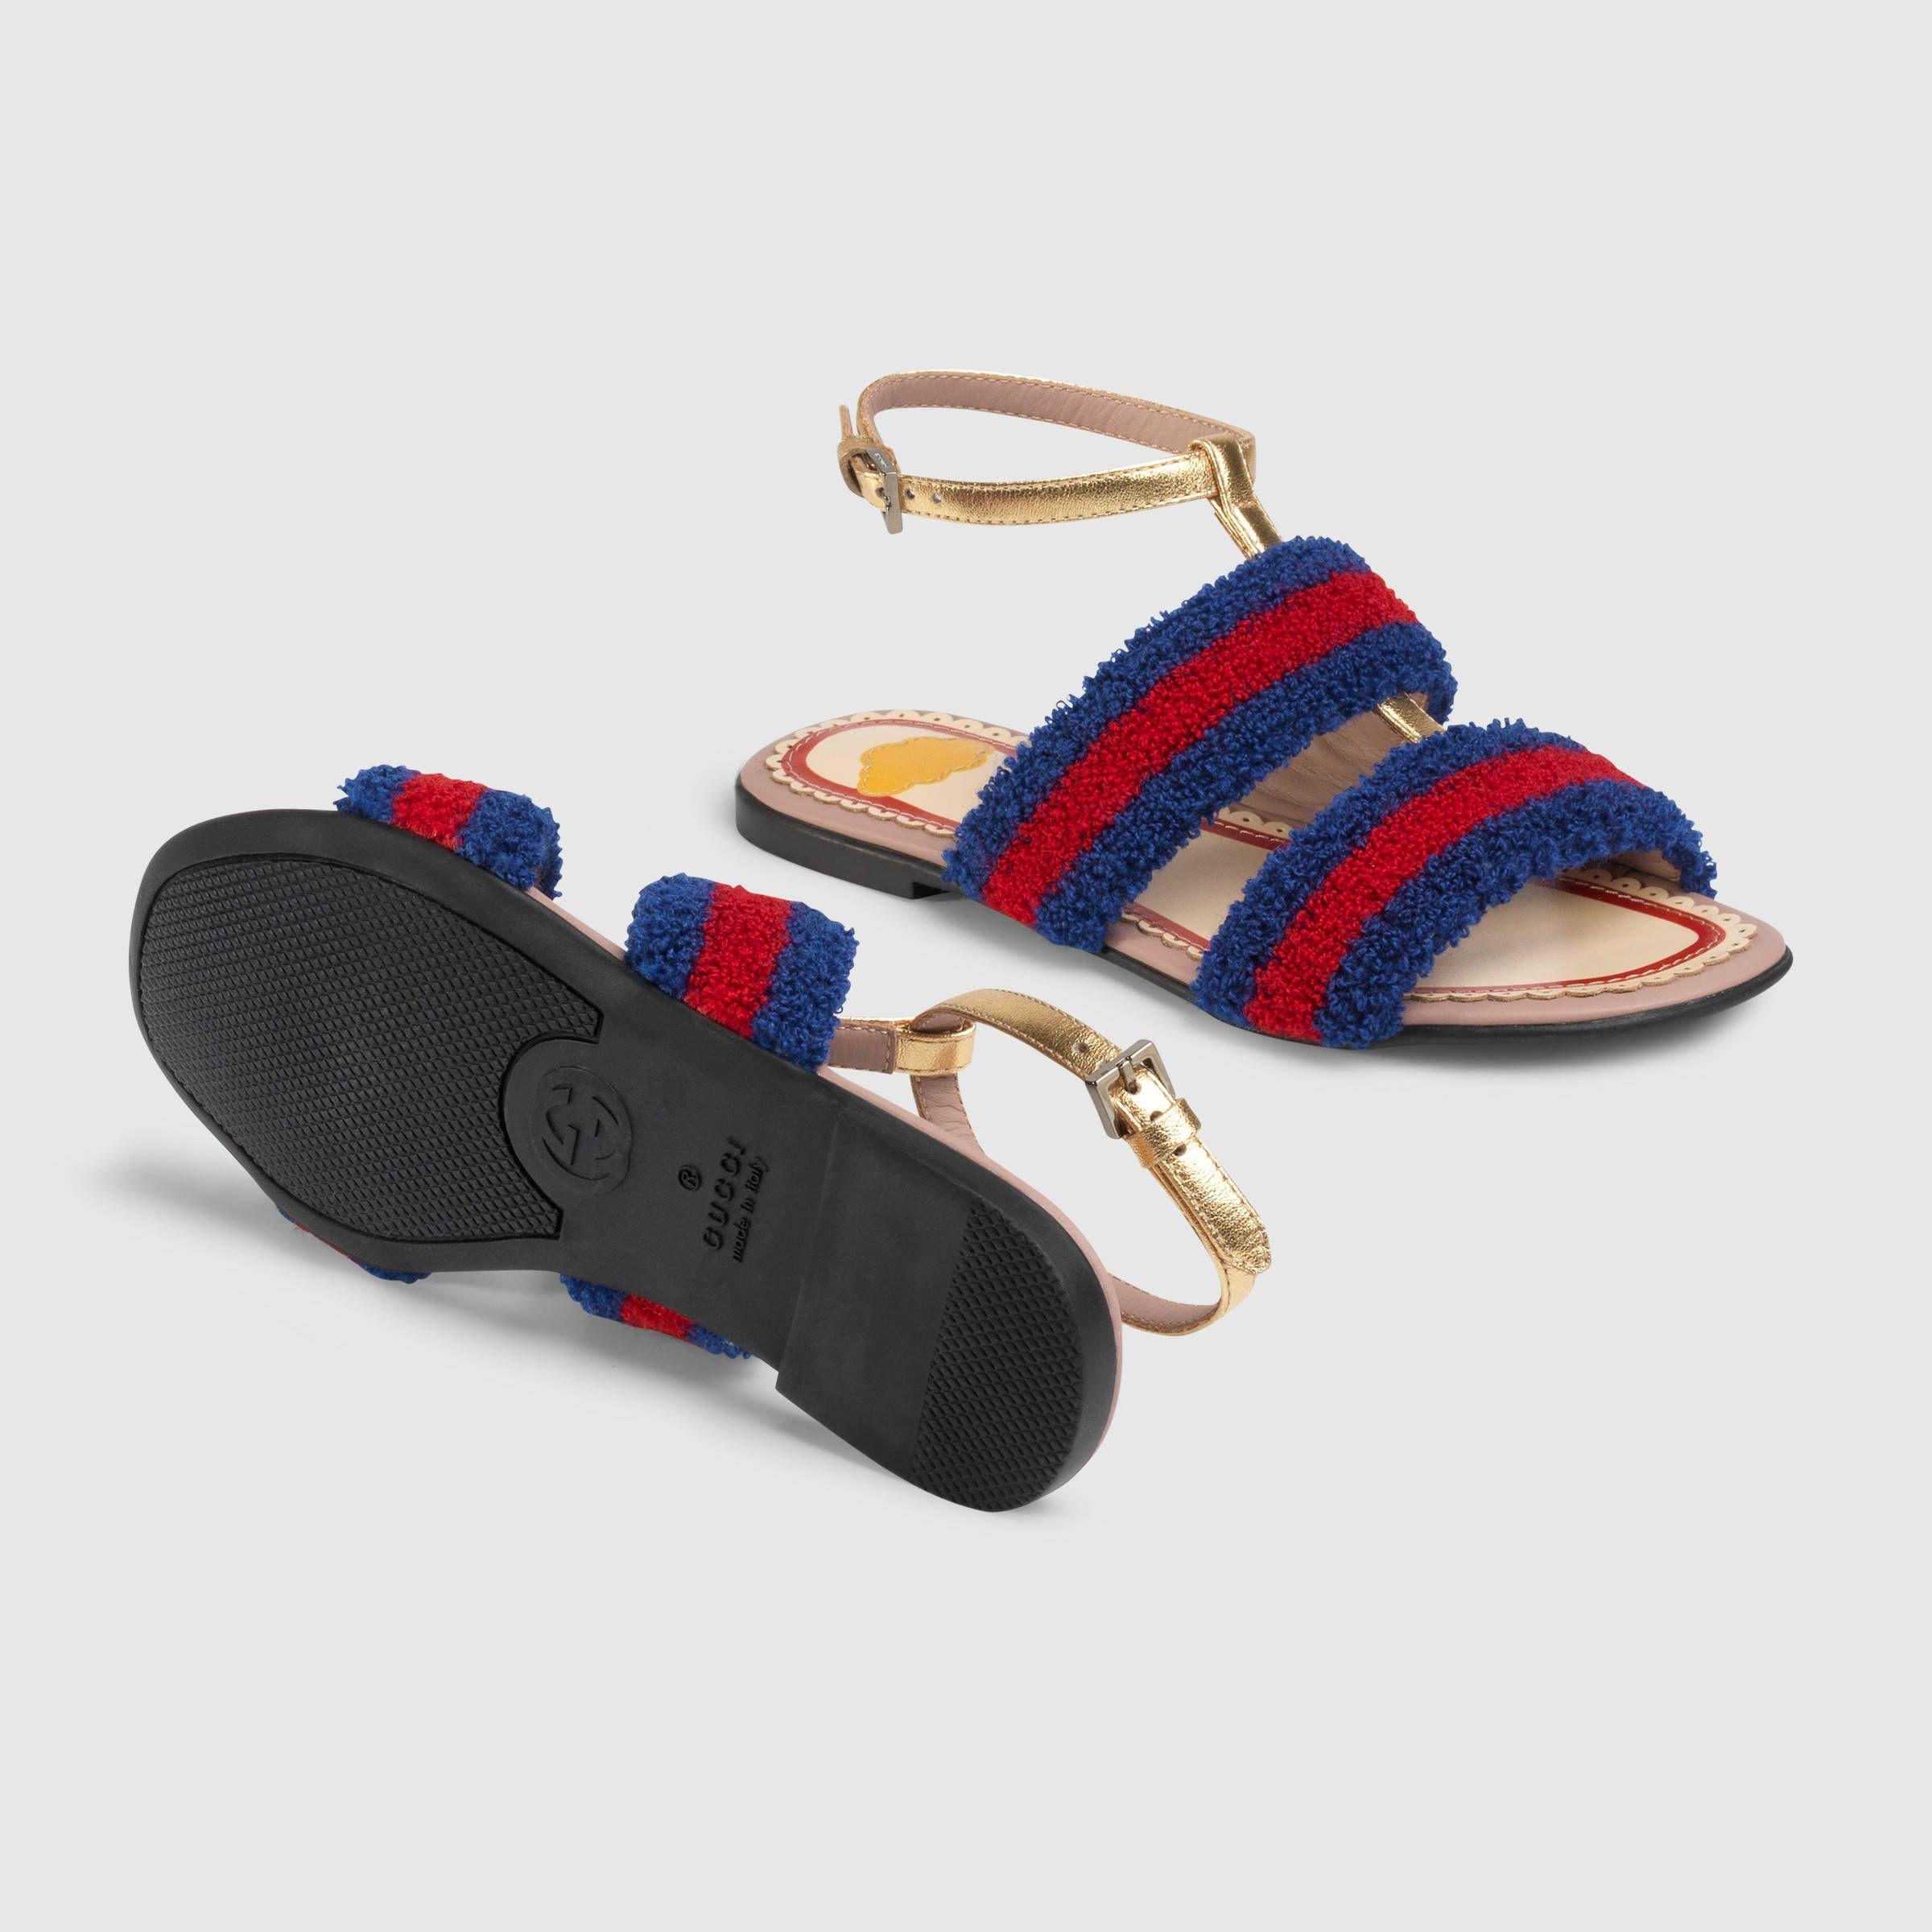 760a28238 Gucci Children s terry cloth sandal Detail 5